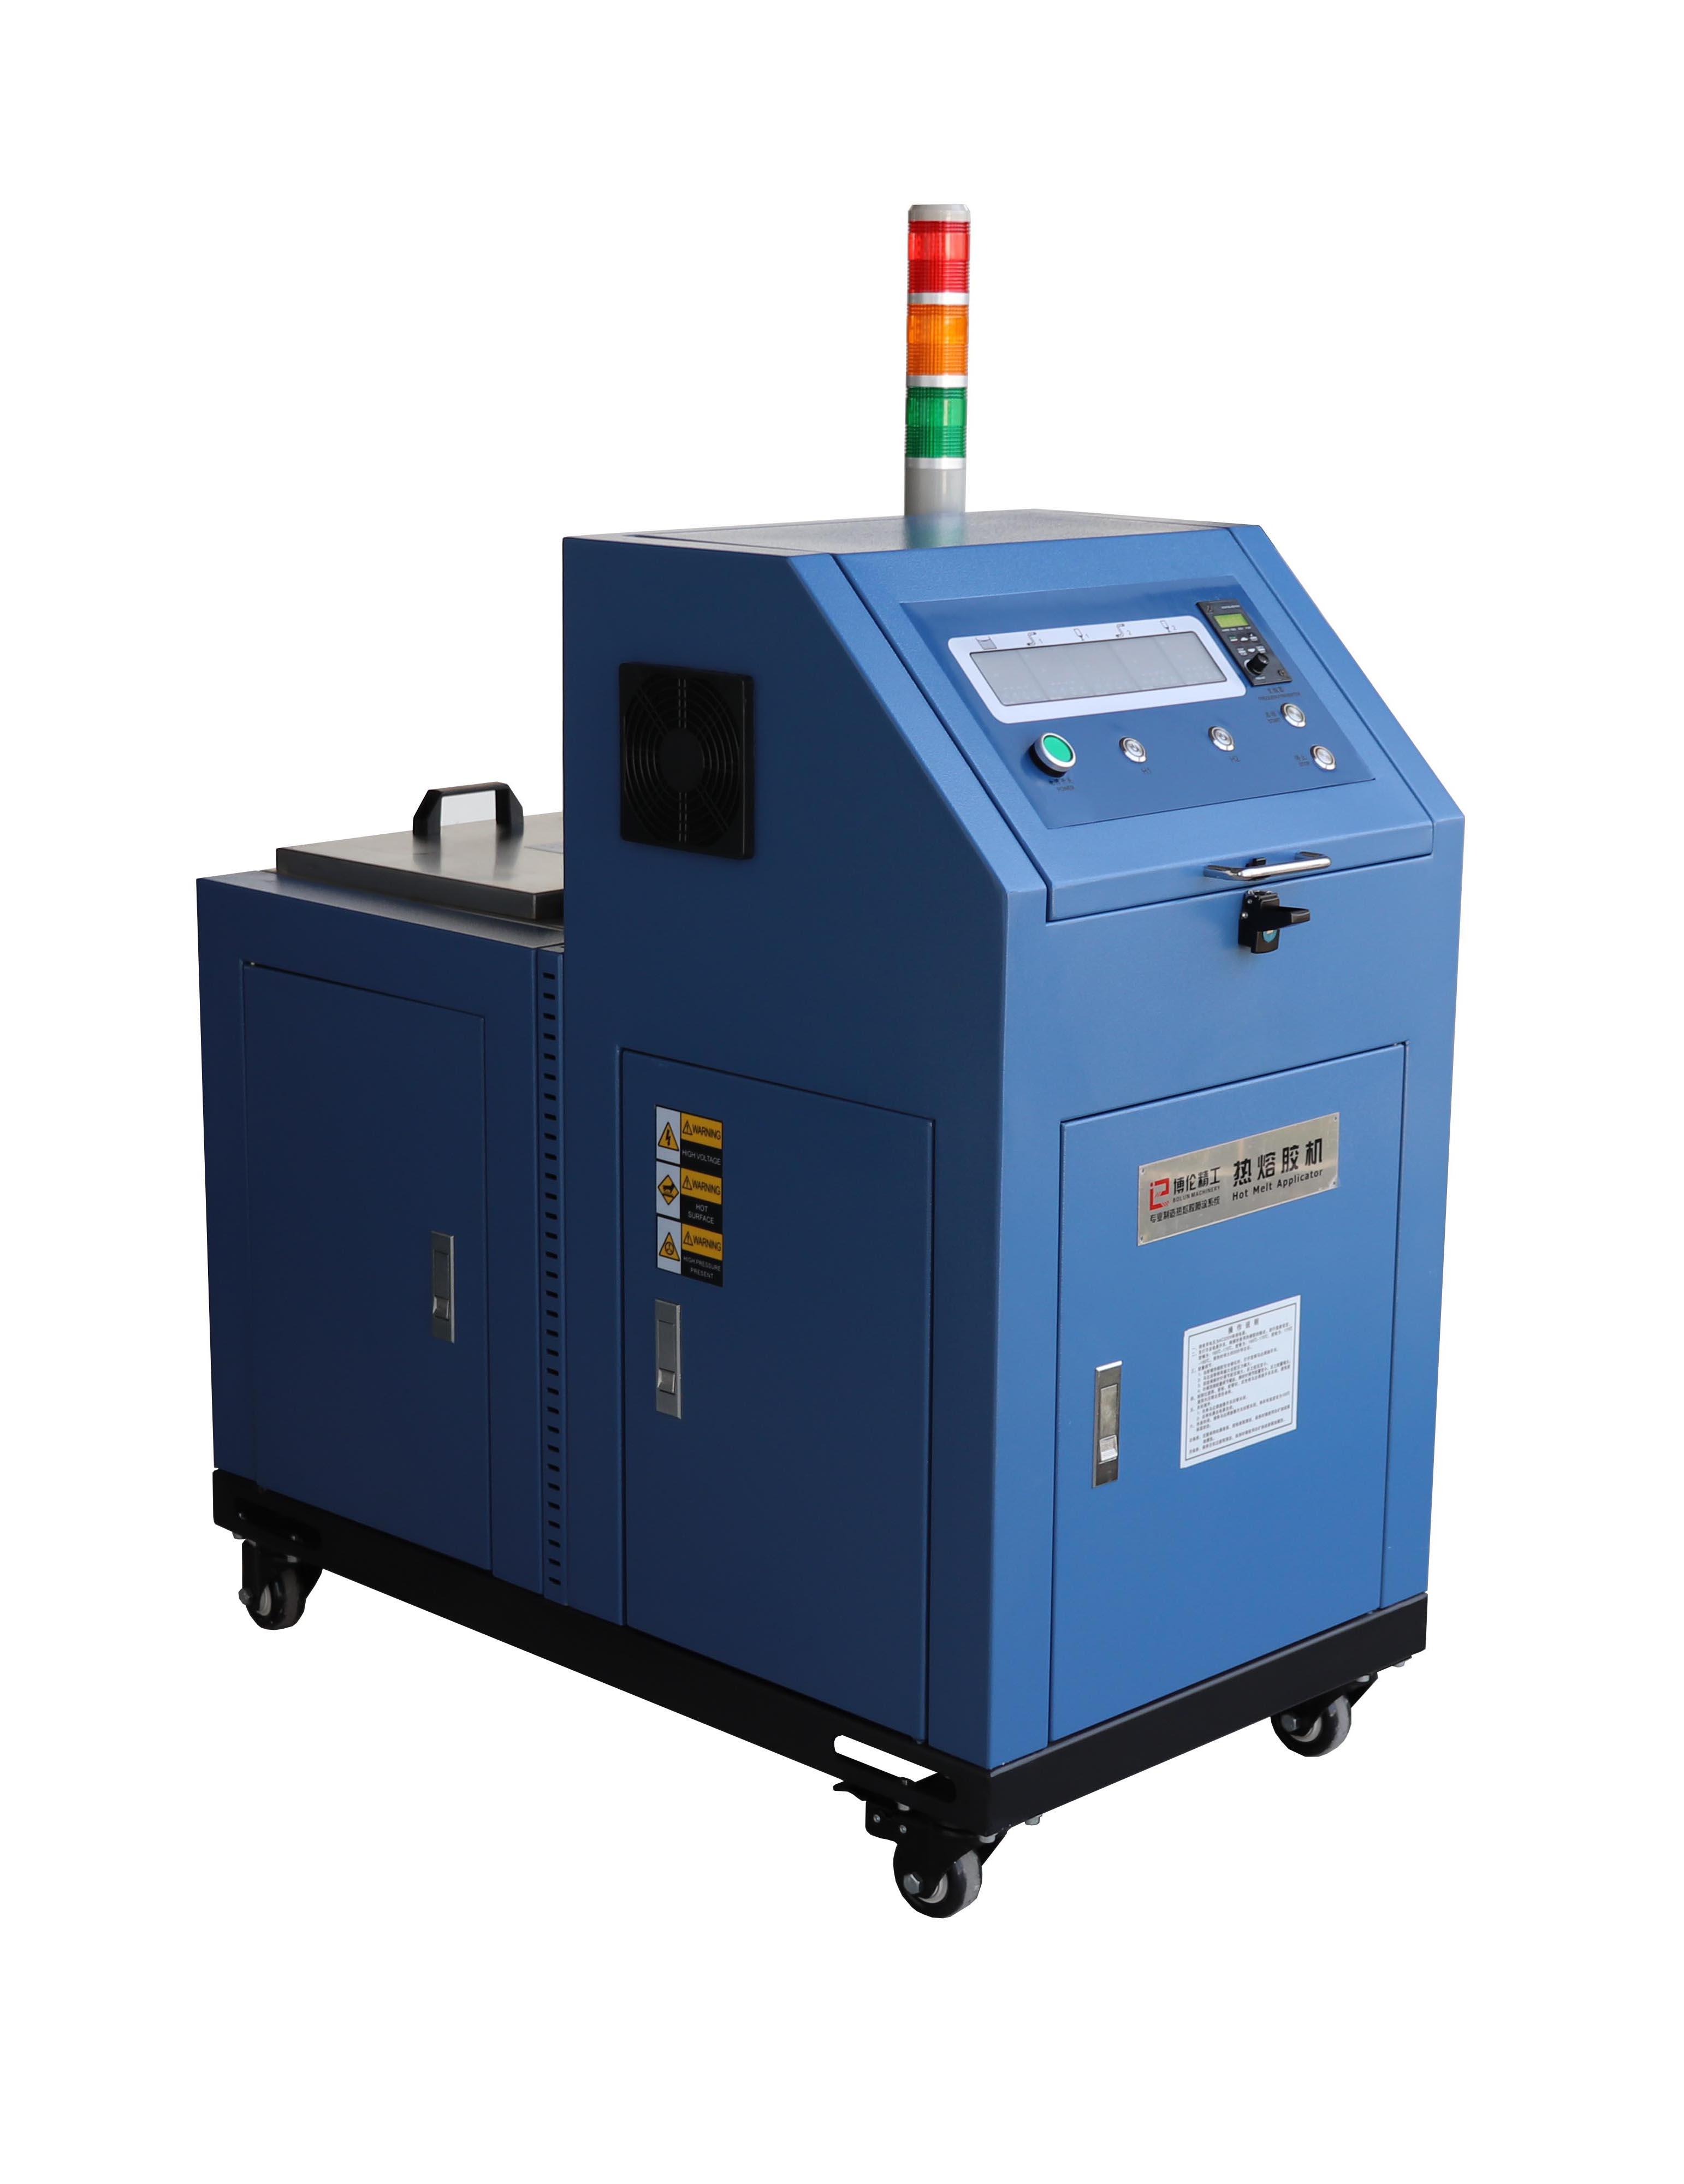 BL-8830M2-30KG 热熔胶机